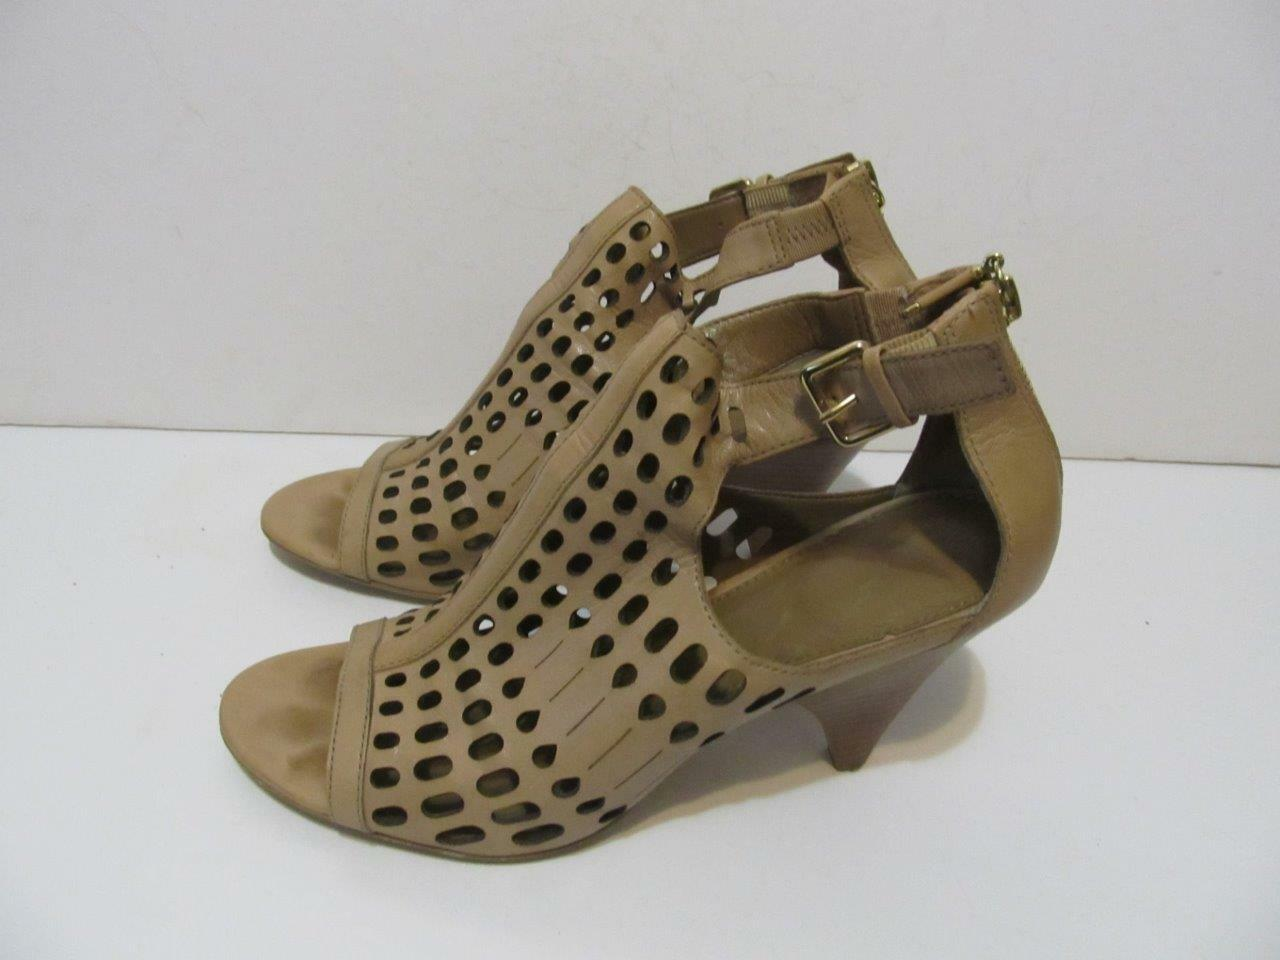 B.MAKOWSKY Ernest Taupe Leather Cutwork Peep Toe Sandal shoes Size10MEUC